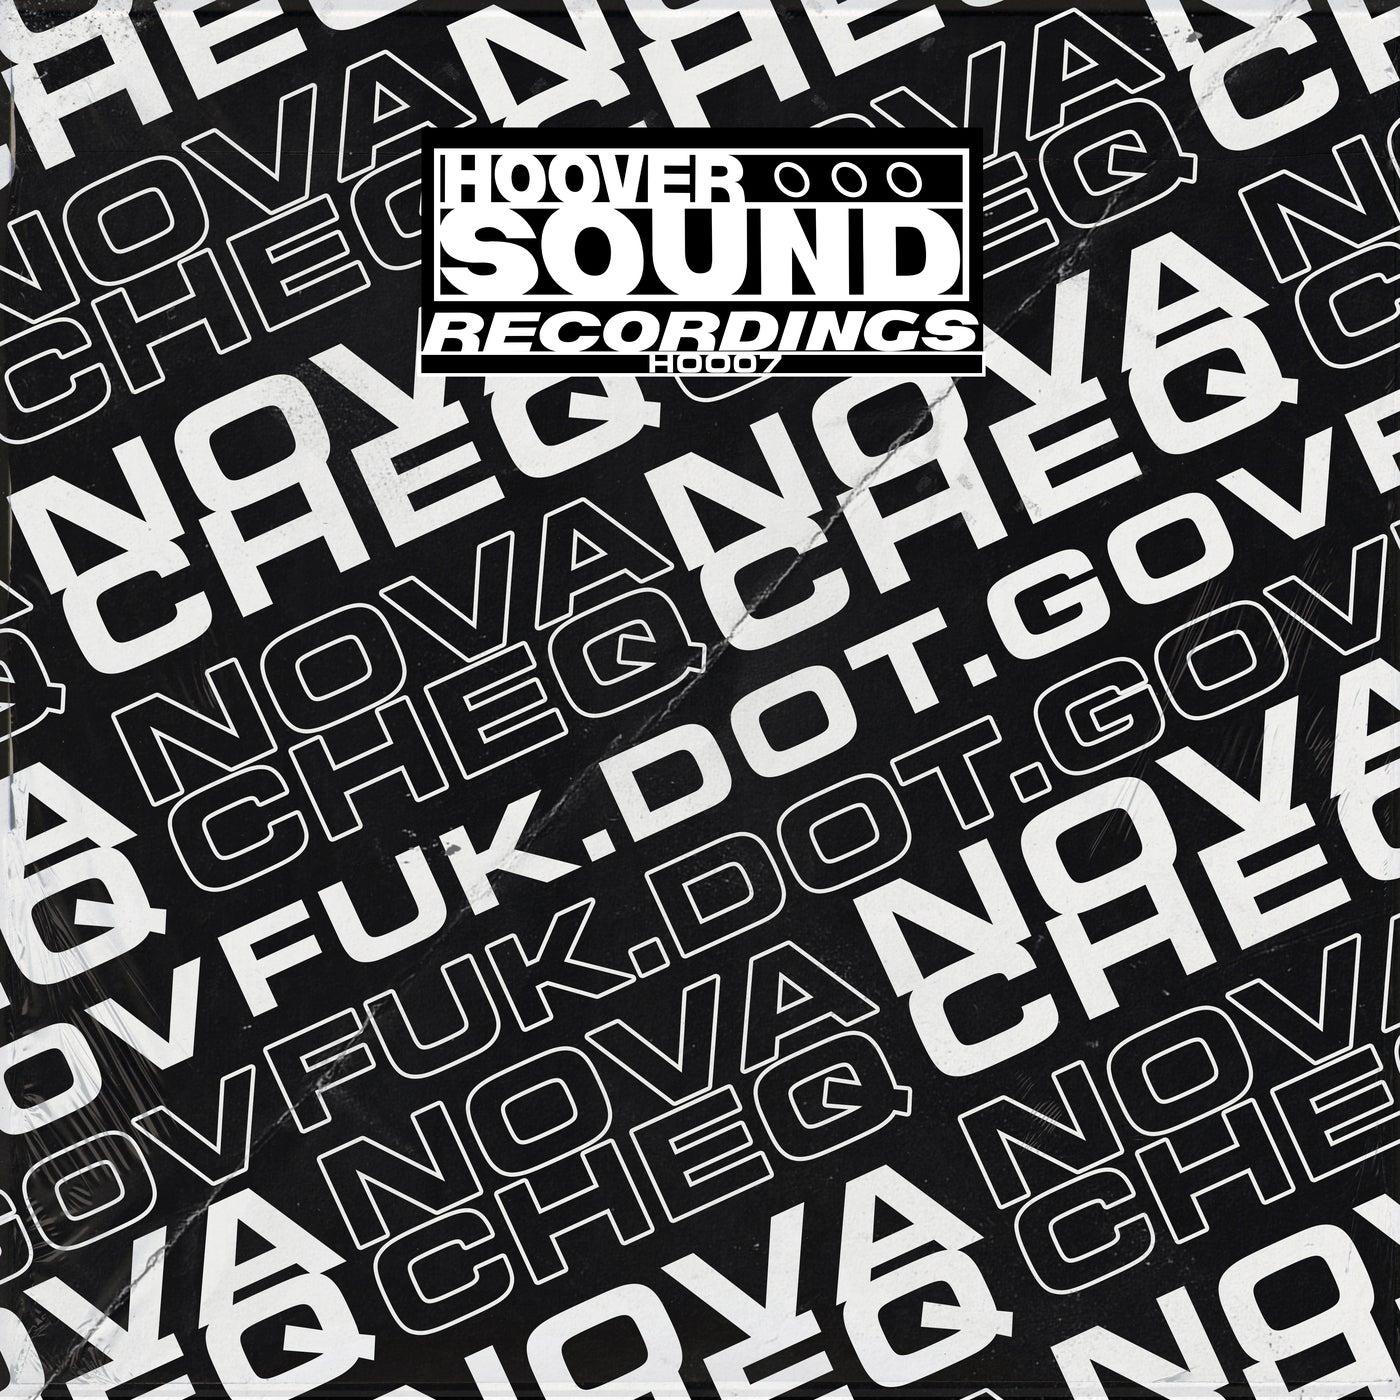 FUK.GOV.UK (Original Mix)